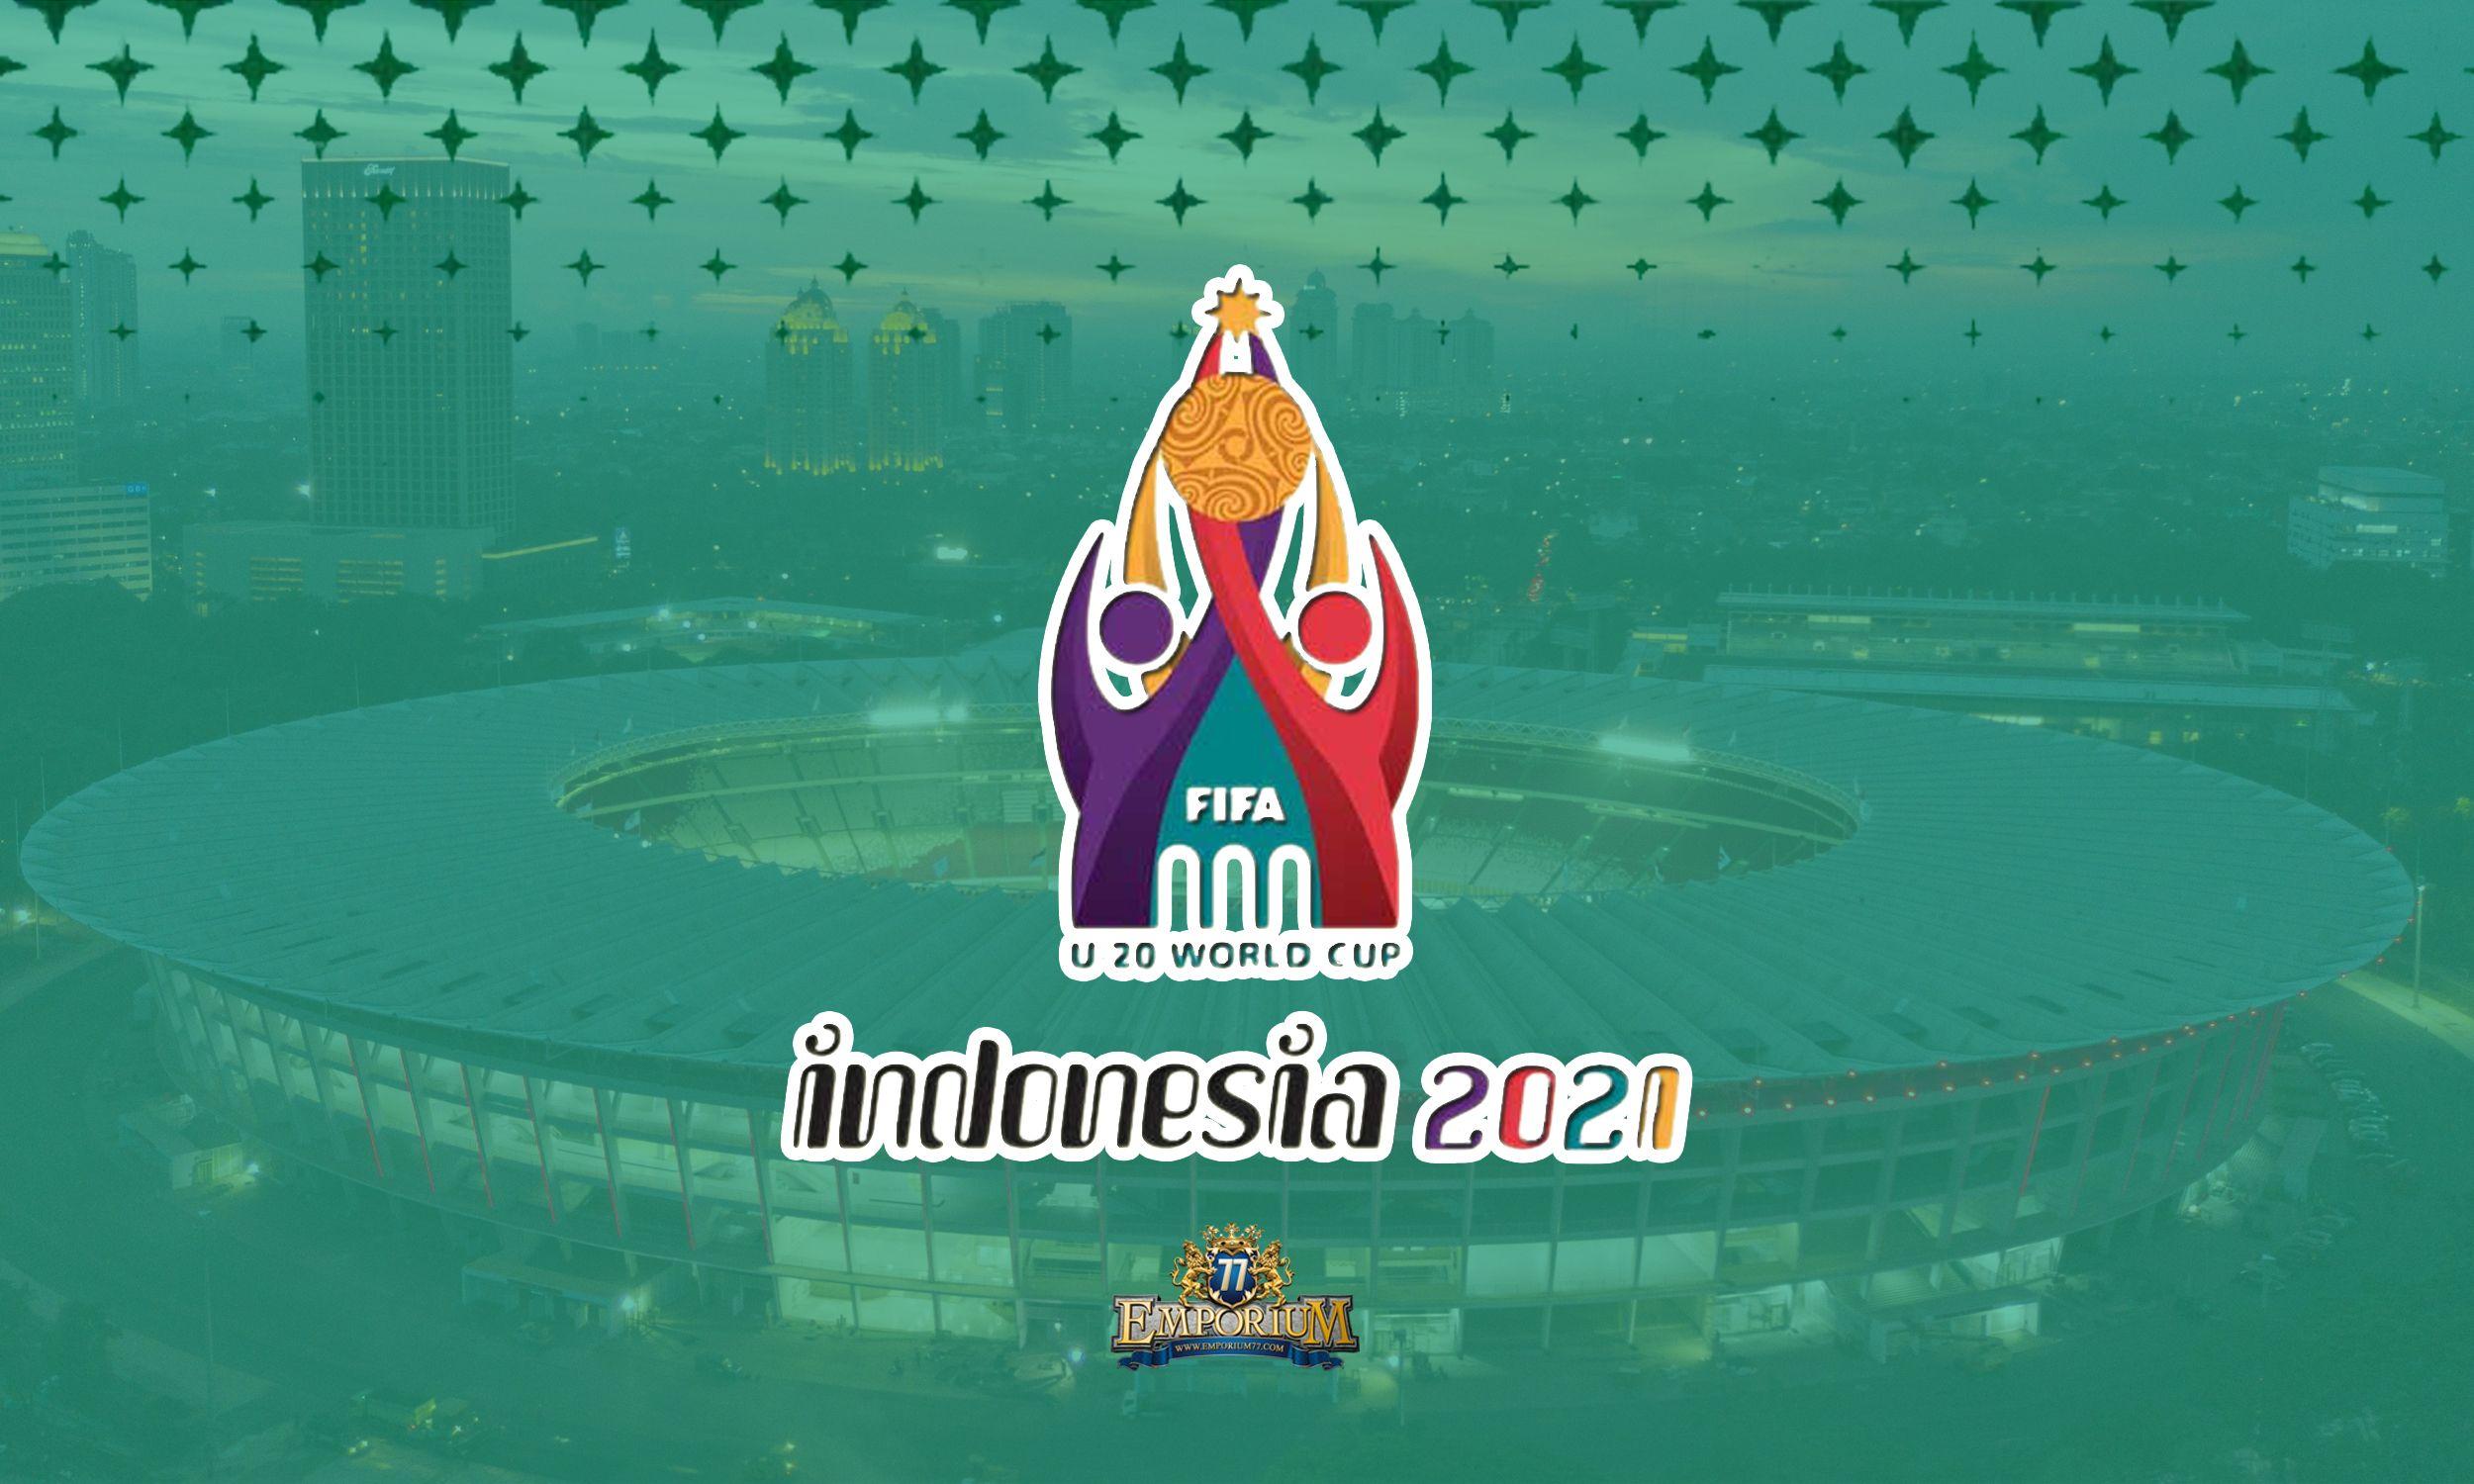 Cerita Di Balik Logo Piala Dunia U 20 2021 Piala Dunia Dunia Indonesia